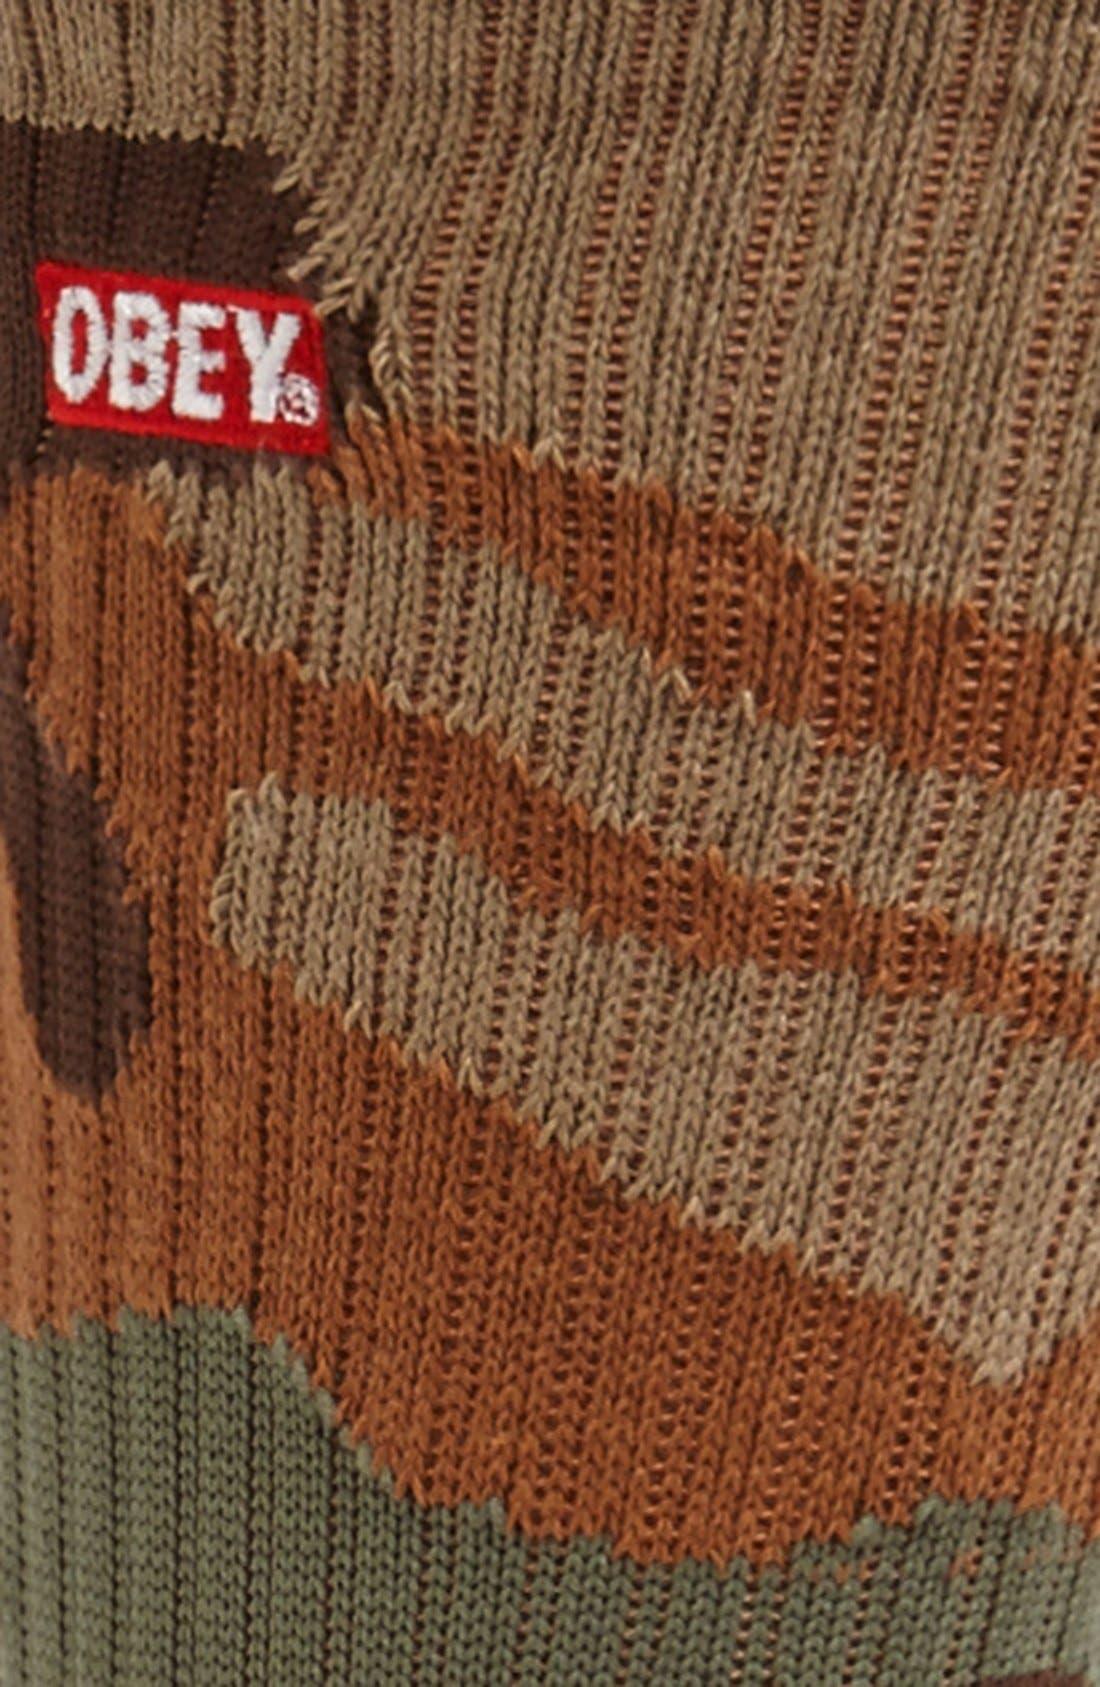 Alternate Image 2  - Obey 'Quality Dissent' Socks